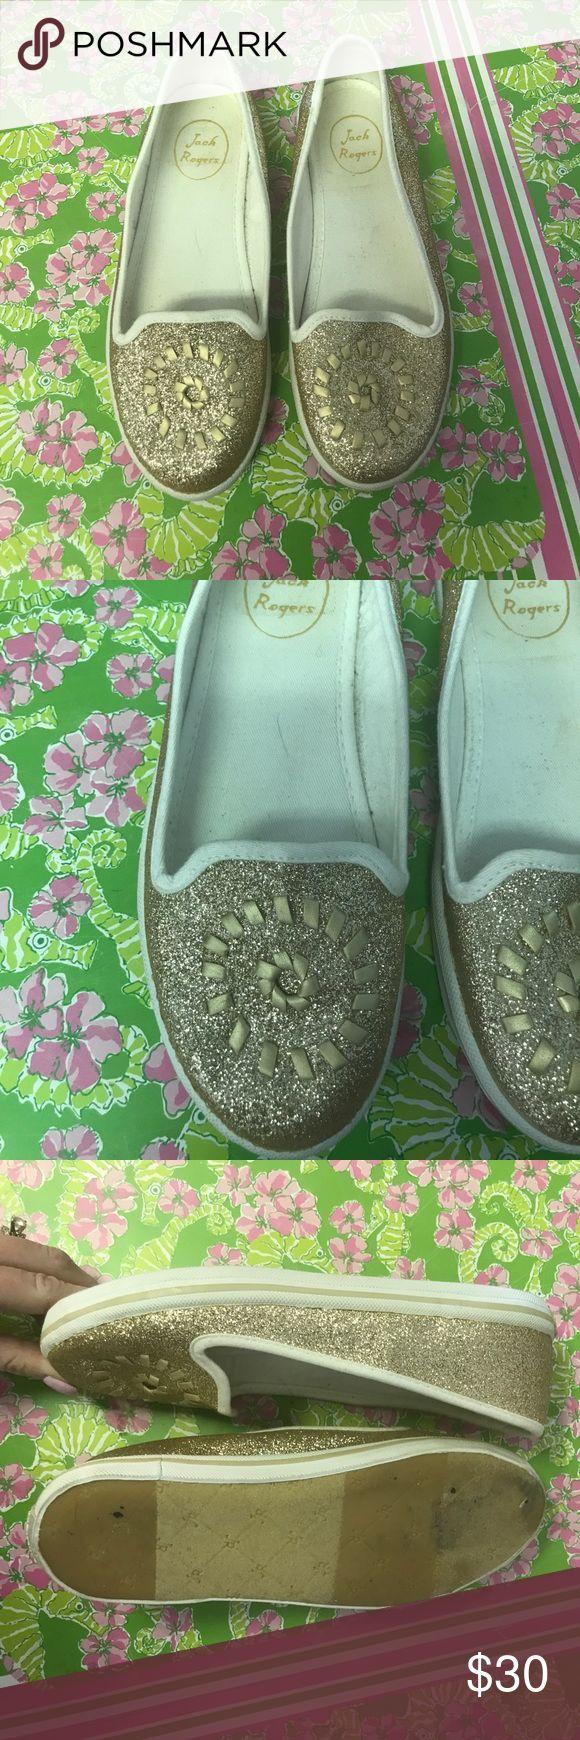 Glitter Jack Rogers Mila flats Gold glitter Jack Rogers Mila flats! Worn once. Size 6 Jack Rogers Shoes Flats & Loafers